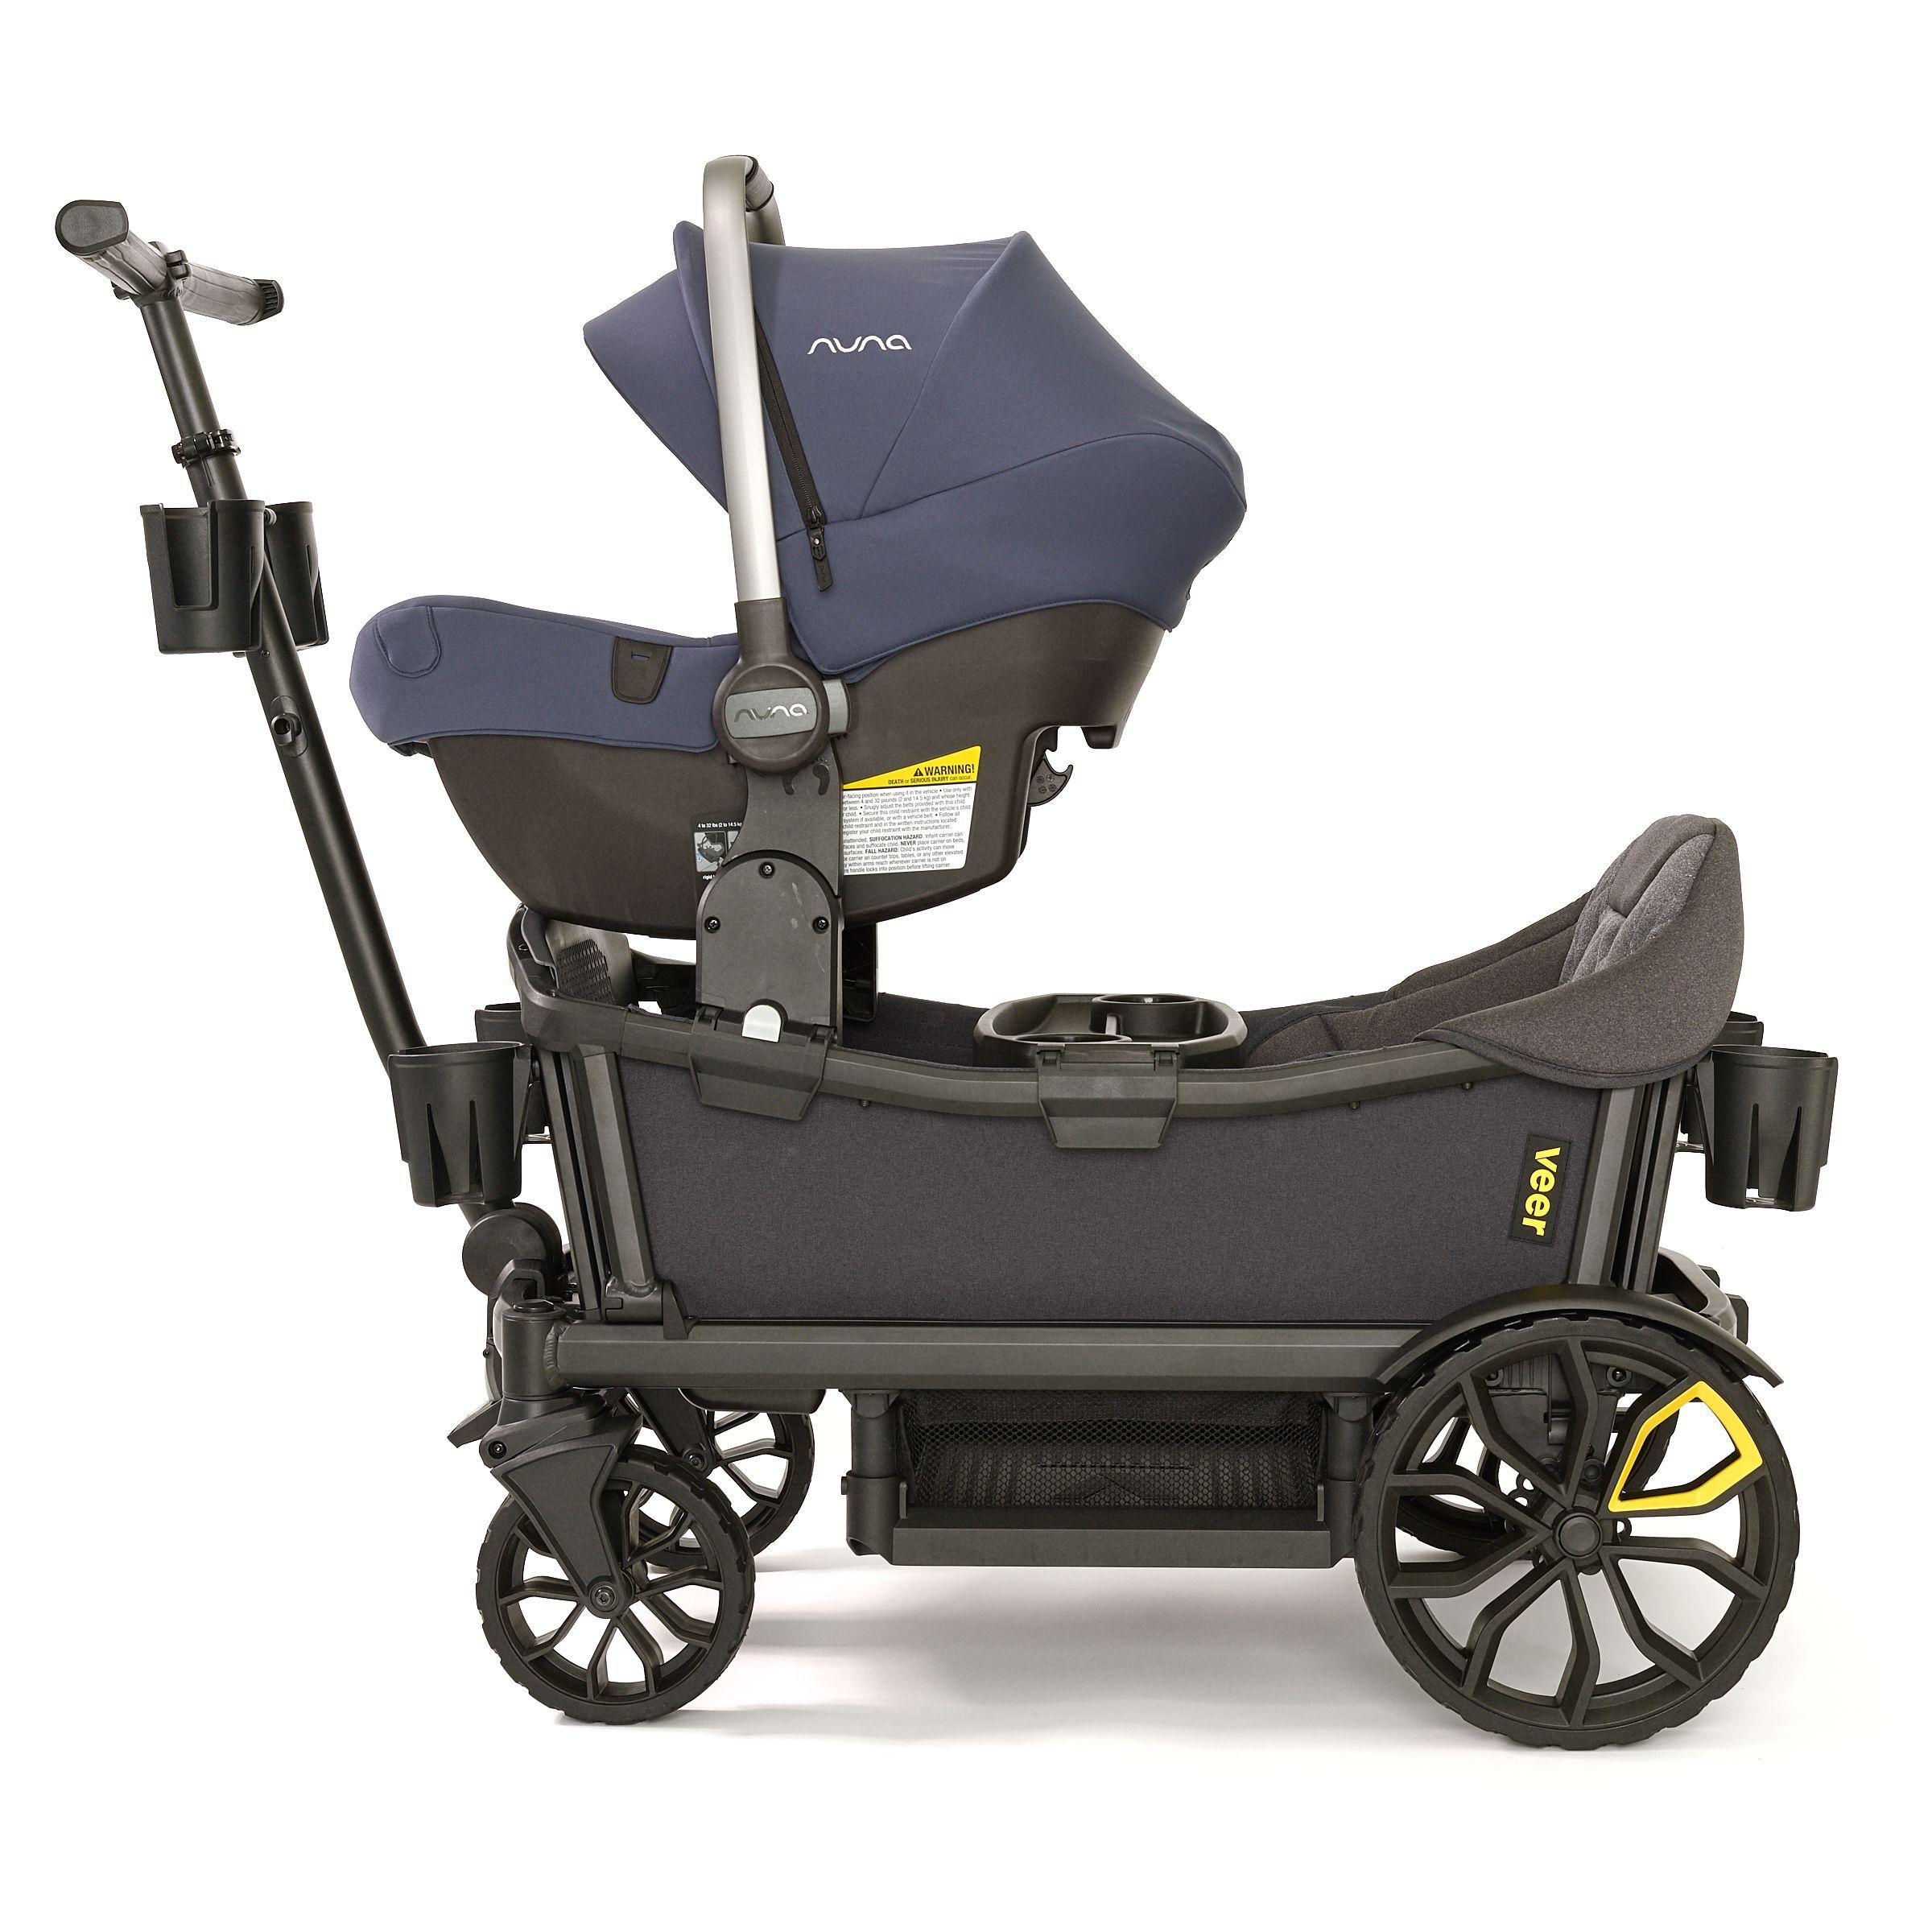 Cruiser Veer Cruisers Baby car seats, Baby strollers